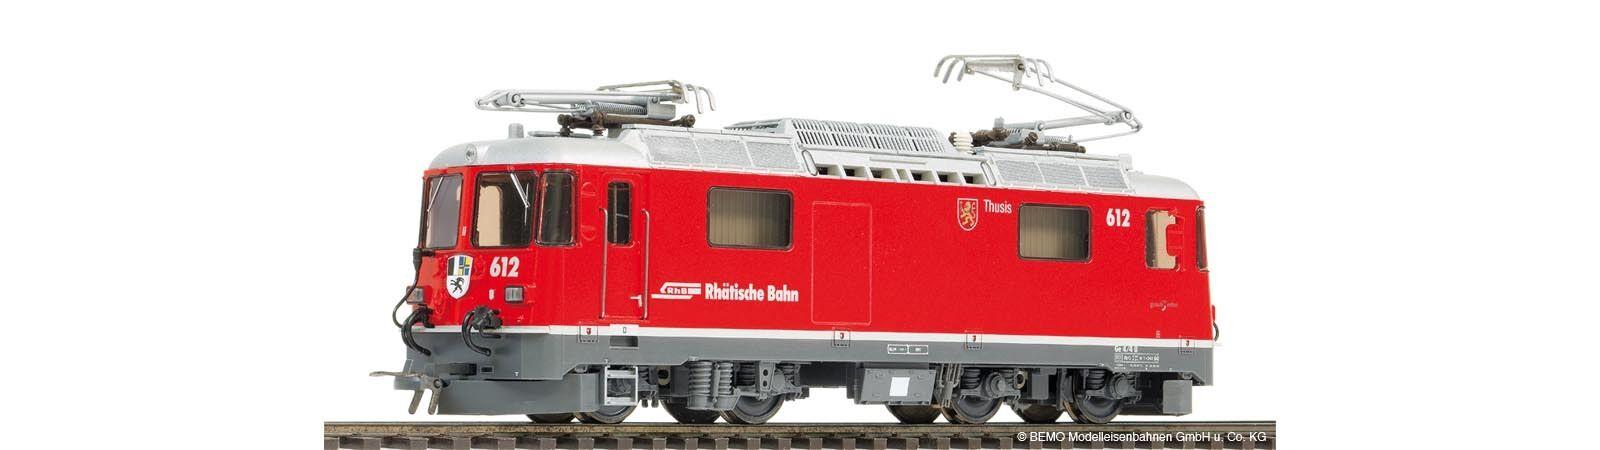 Bemo 1258 162  1258162 Schmalspur-E-Lok Ge4 Ge4 Ge4 4II 612 Ep5(2010) red Thusis H0m 0b40a1